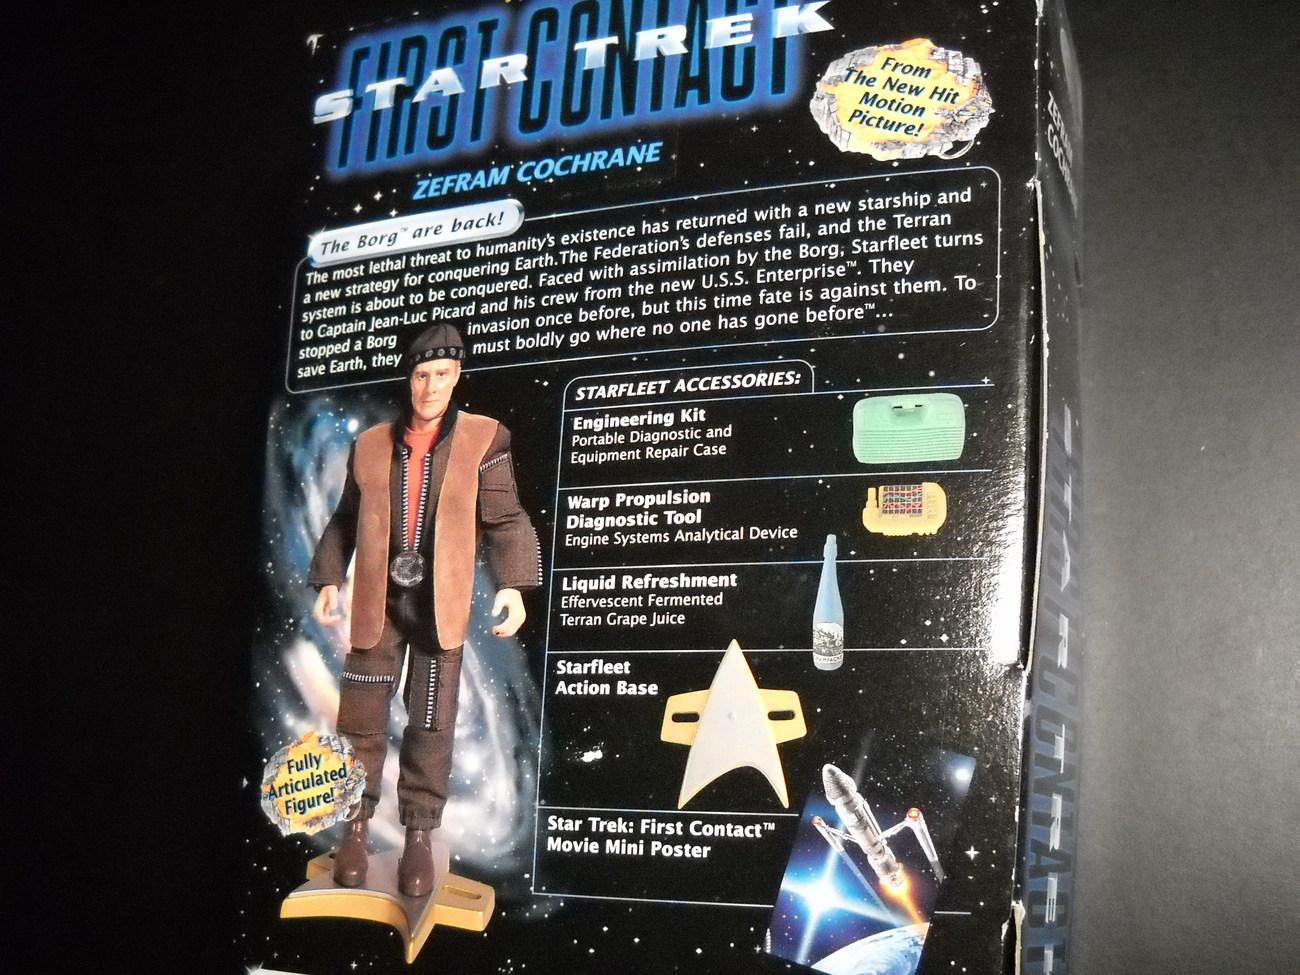 Star Trek First Contact Movie Zefram Cochrane 9 Inch Sealed in Box Playmates